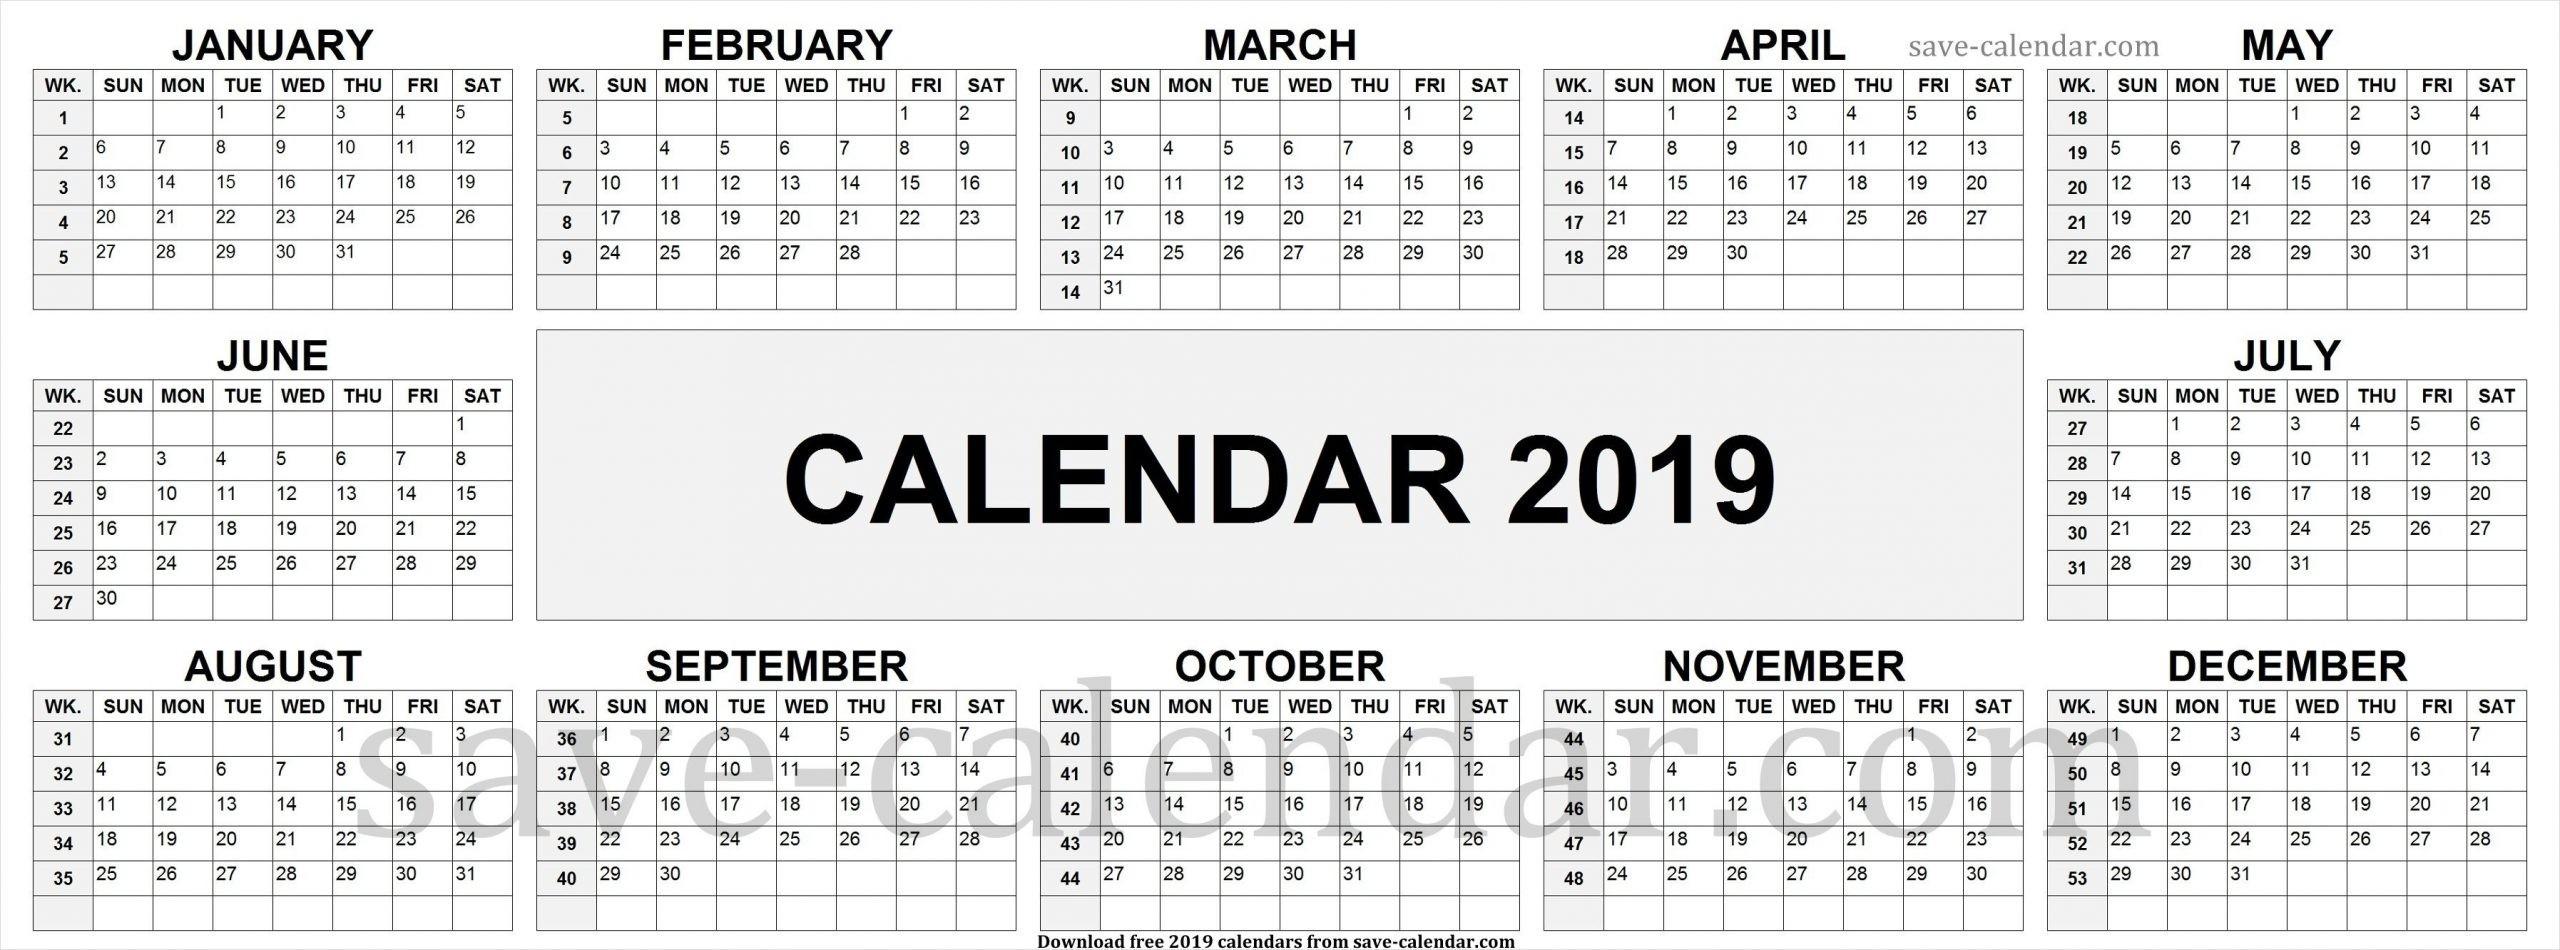 Depo Calendar 2021 Printable | Calendar Template Printable  Depo Calendar 2021 Printable